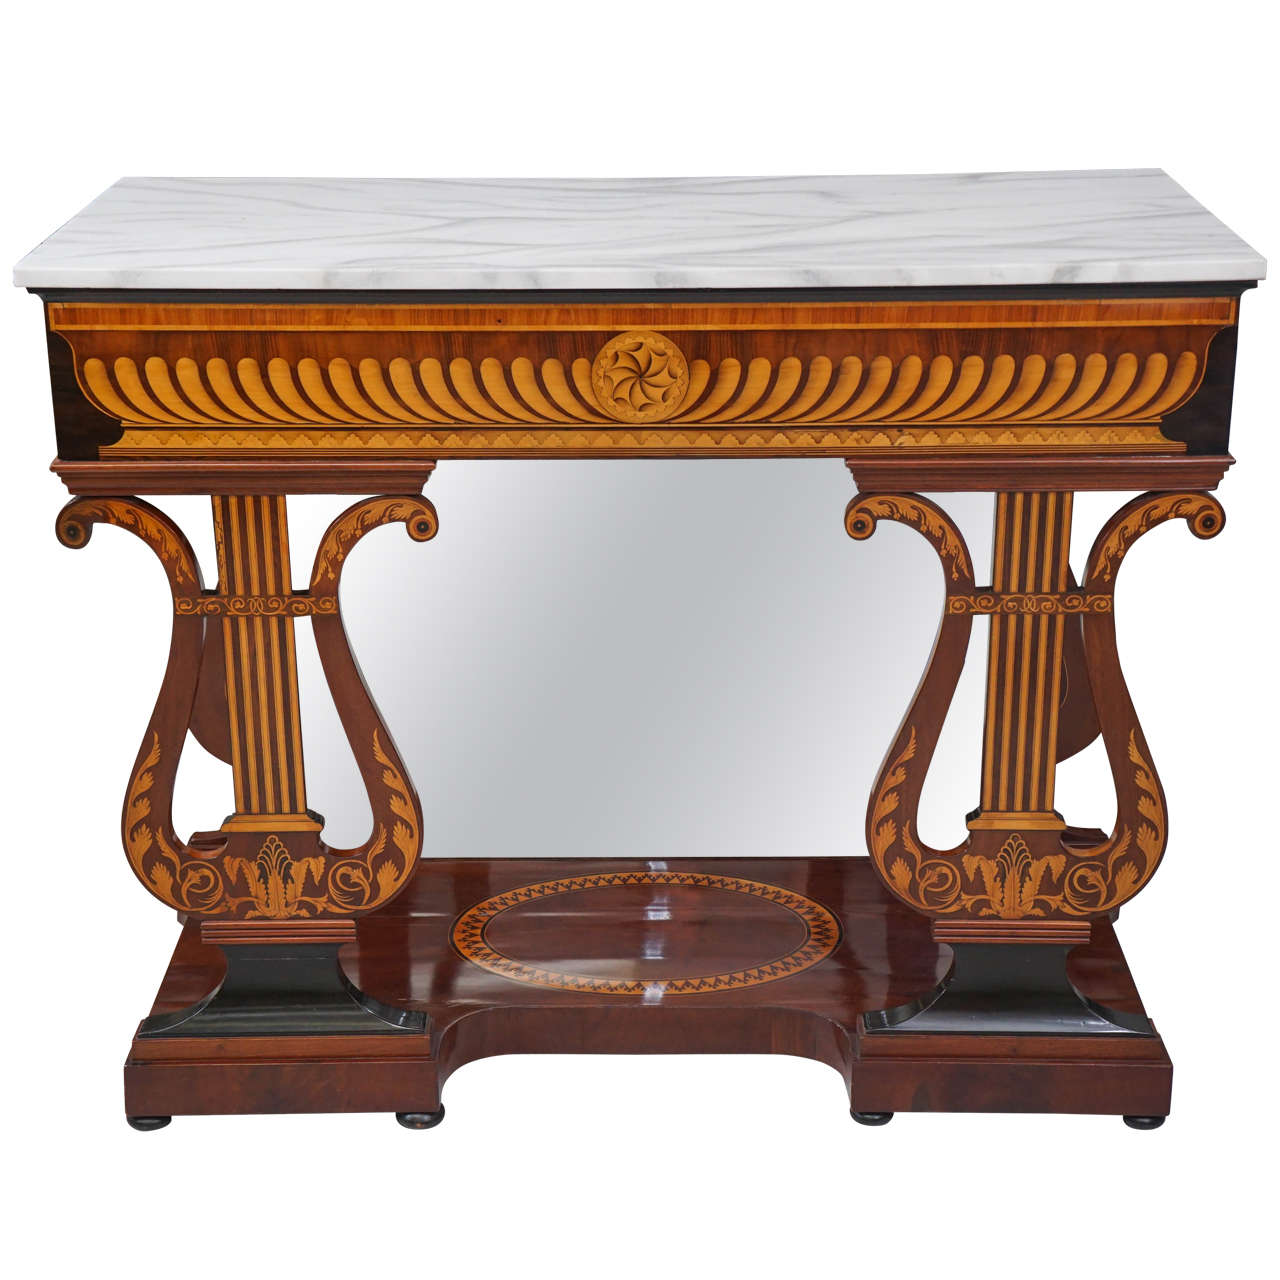 Very Fine Austrian Biedermeier Marble Topped Console Table